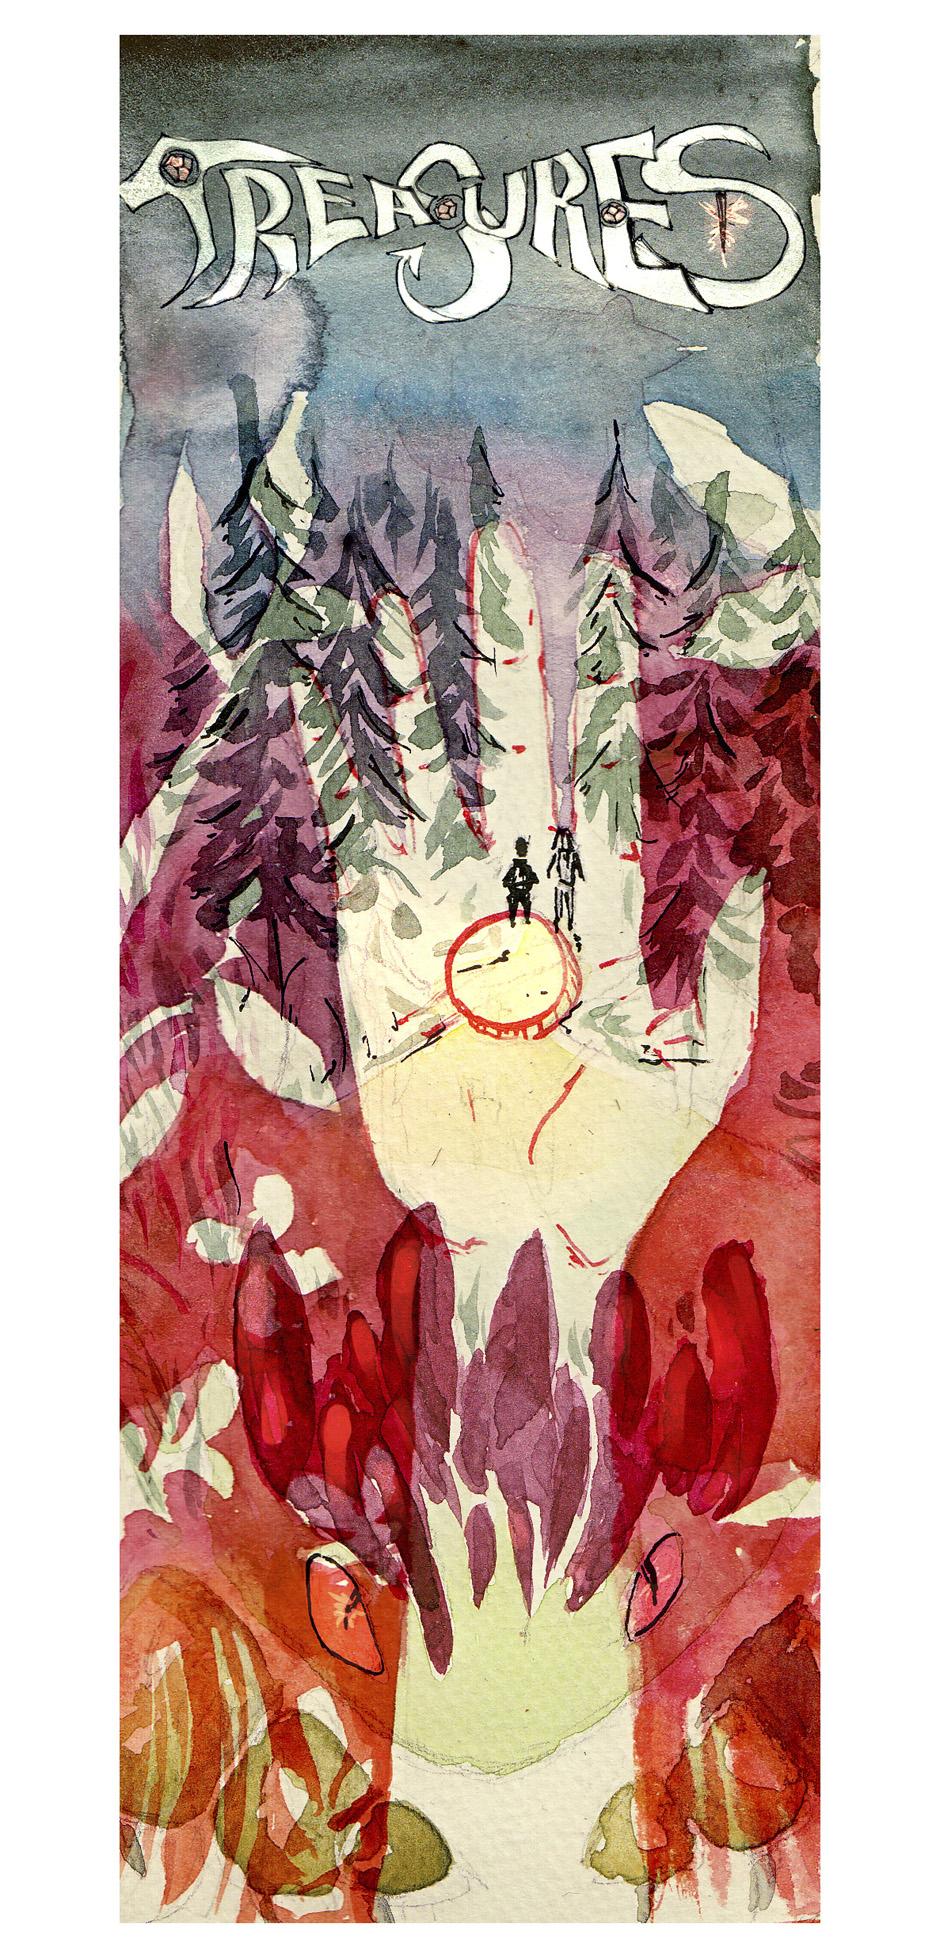 Sm-pg-012-cover by Ilman-Lintu